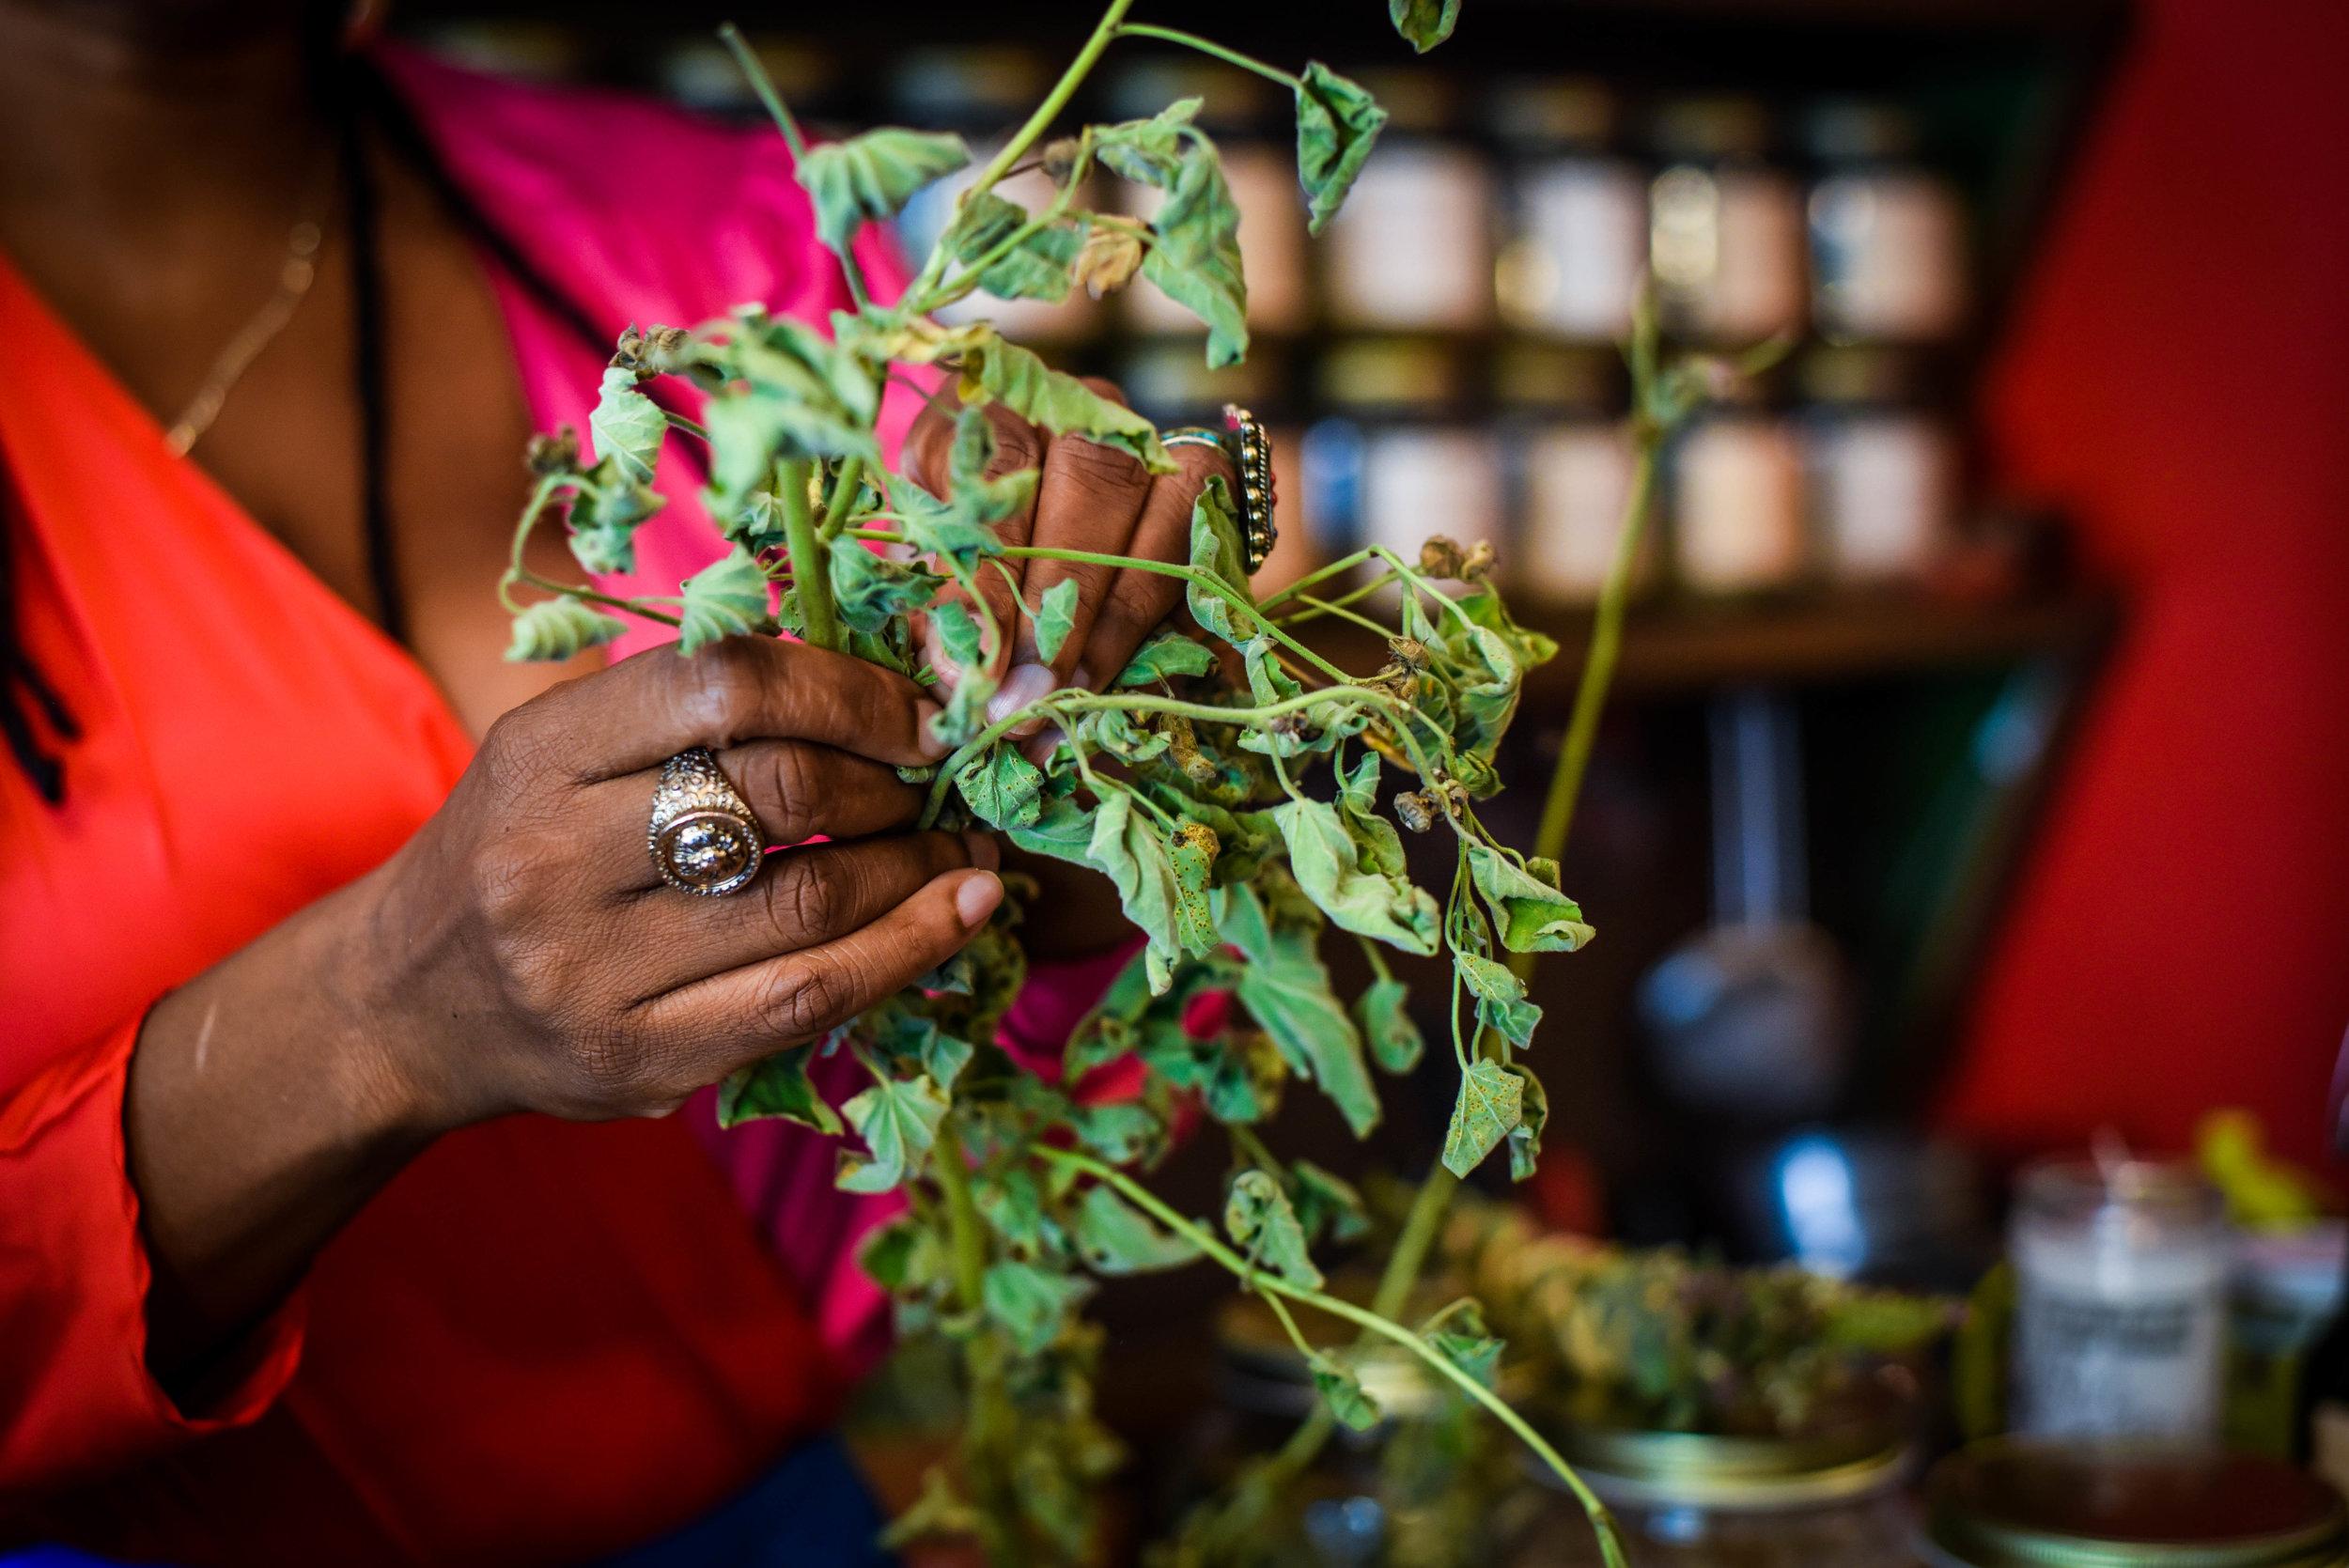 Herbalist and Spiritual Teacher Karen Rose inside Sacred Vibes Apothecary